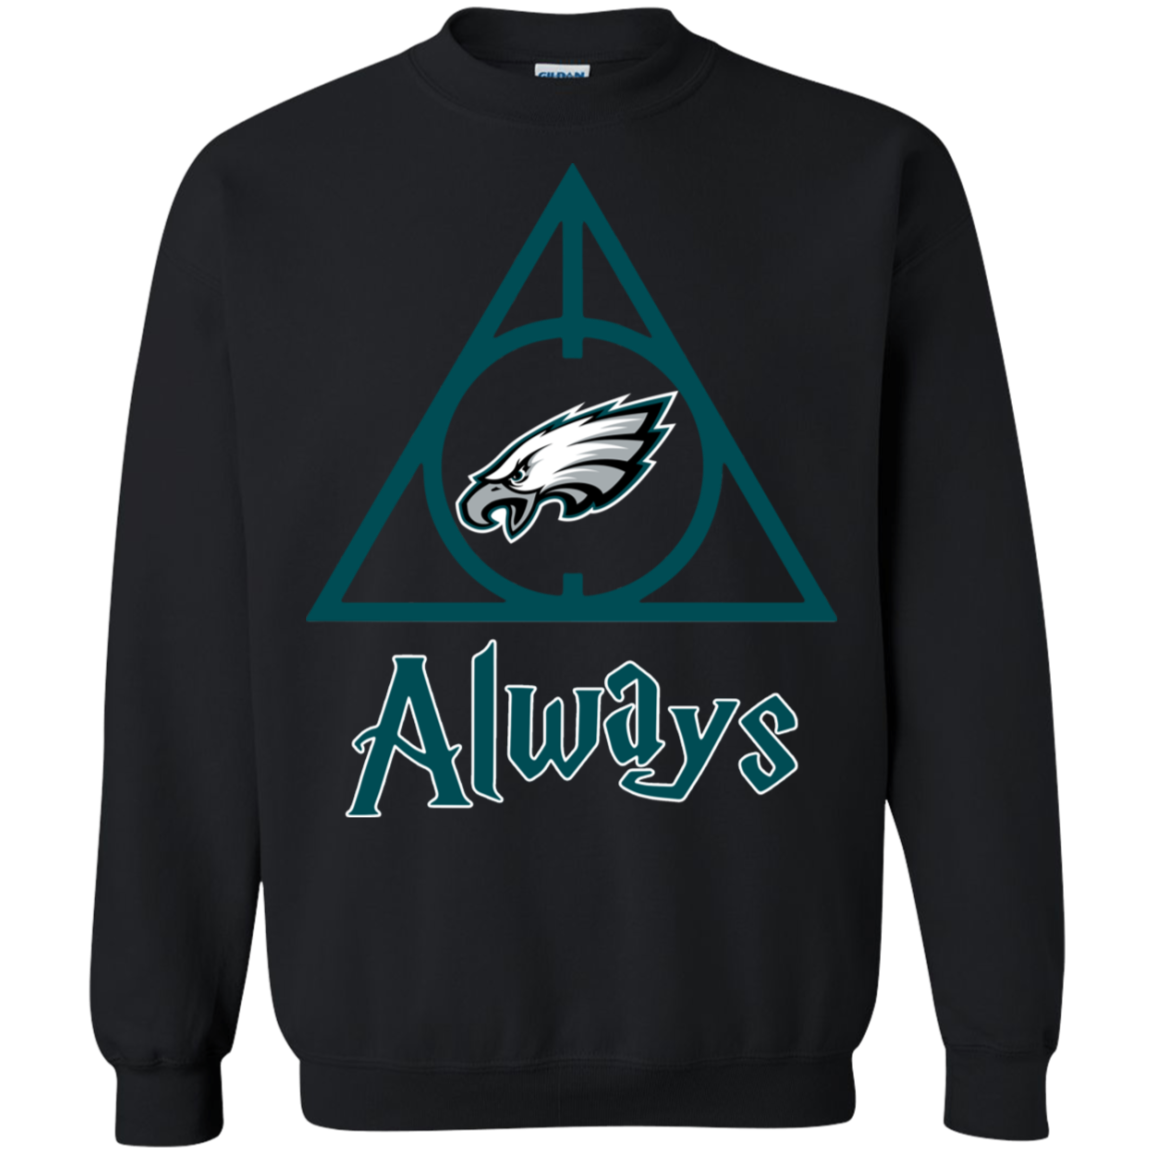 Philadelphia Eagles Always Harry Potter Deathly Hallows G180 Crewneck Pullover Swea Shirts